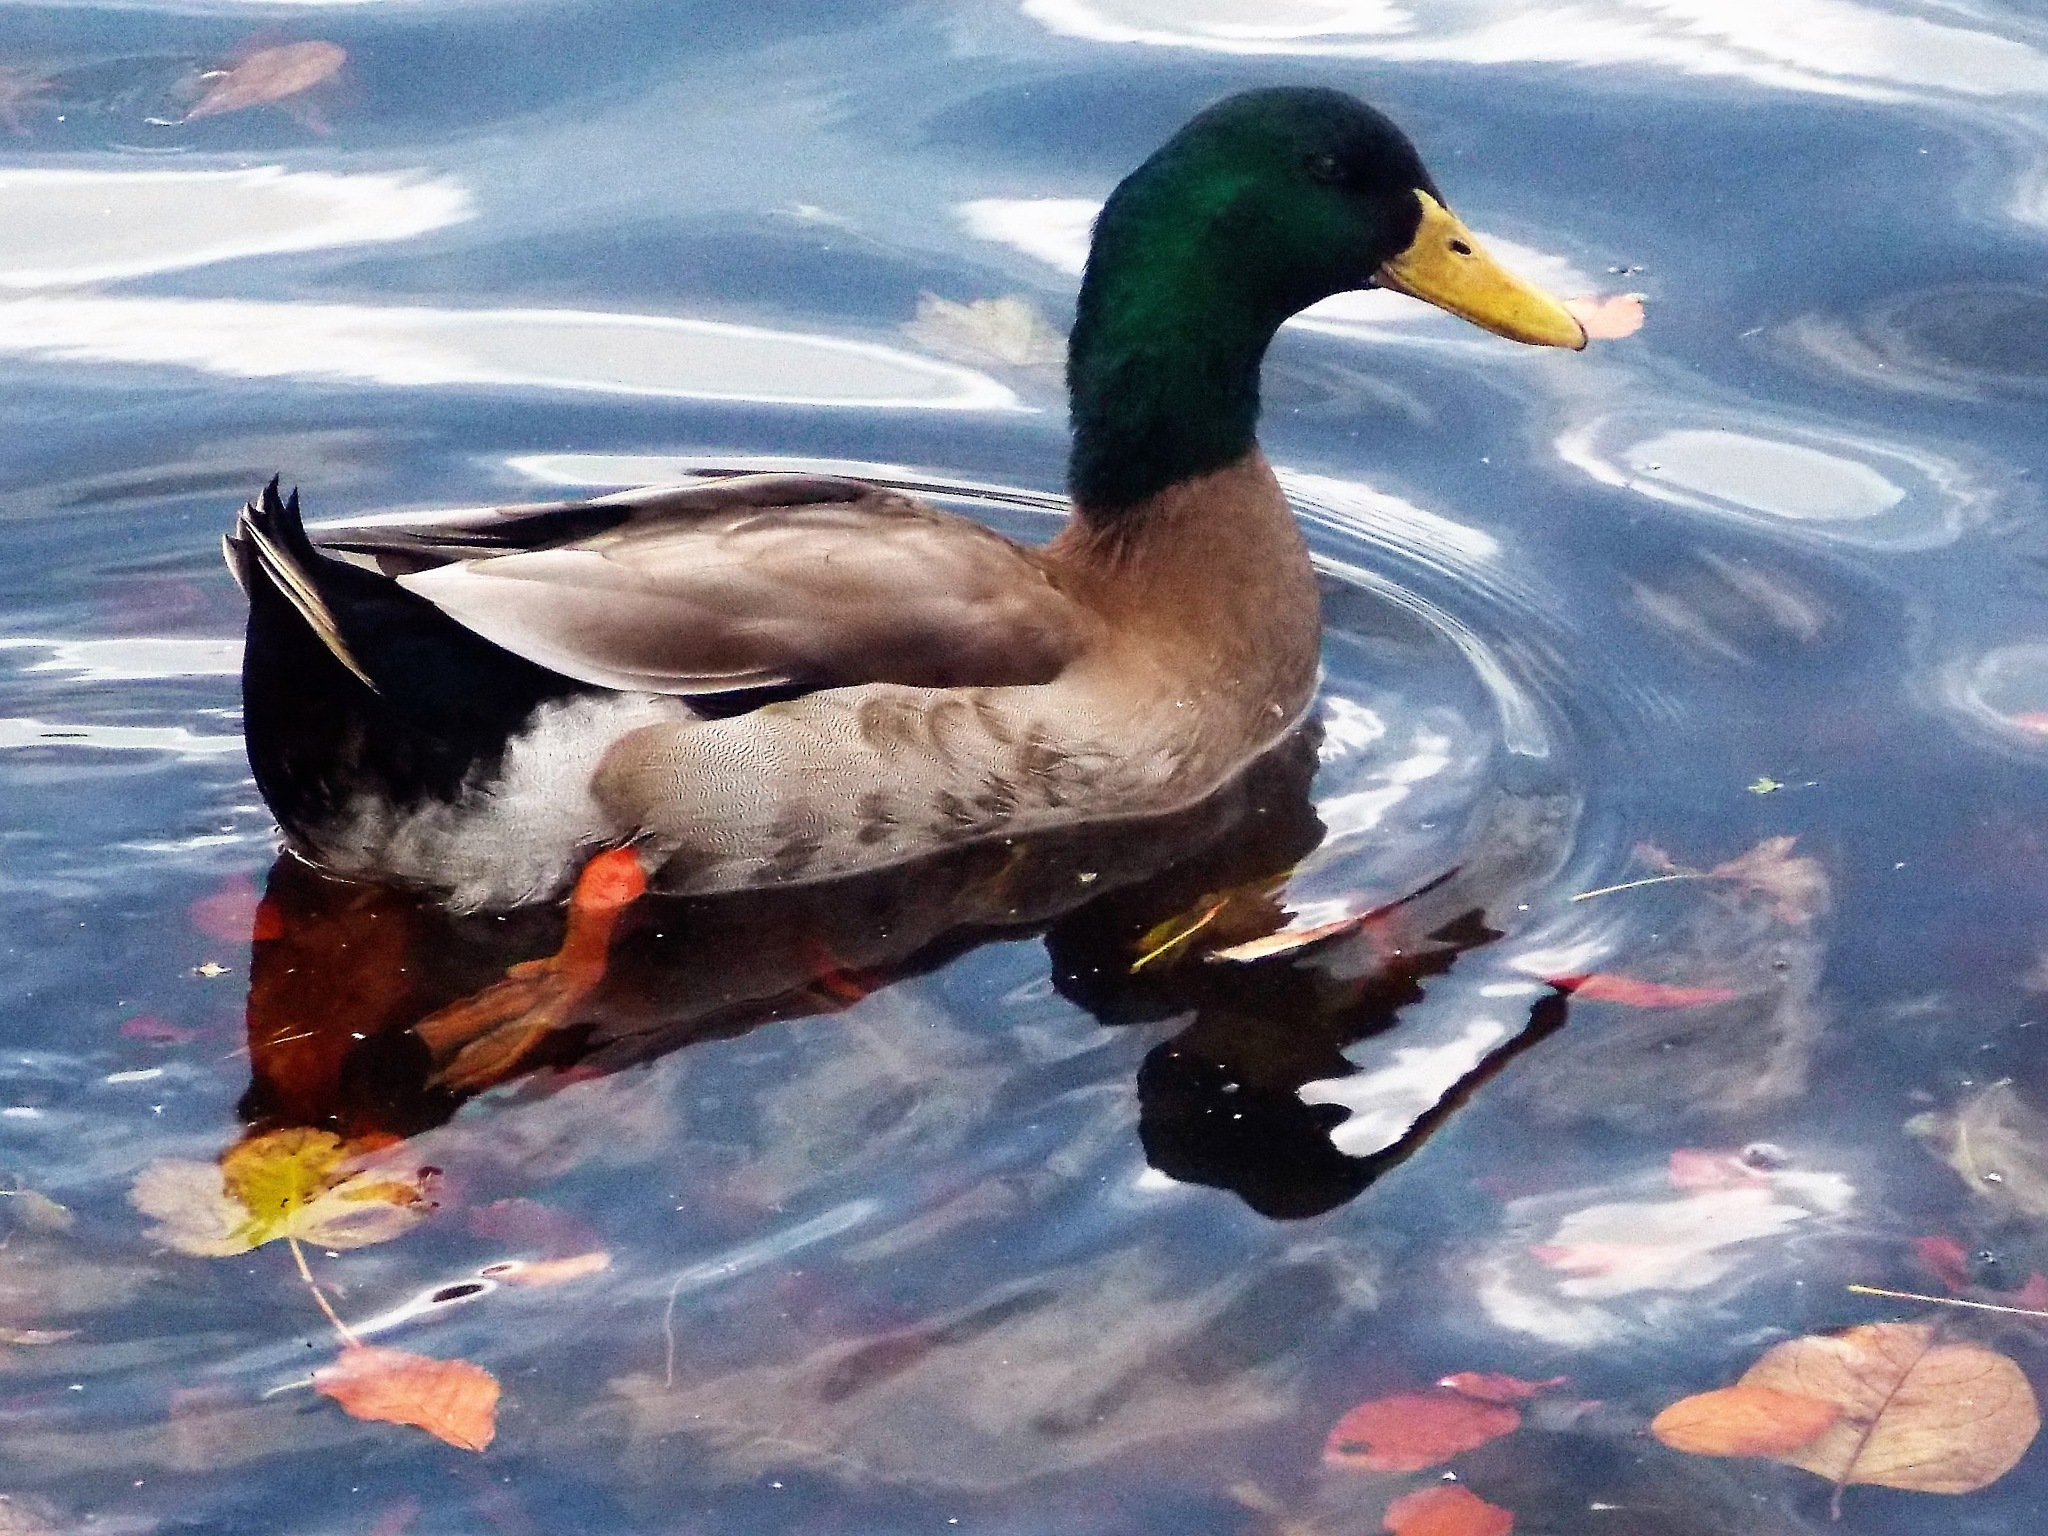 """Mallard Duck"" by Thania Wehmeyer"